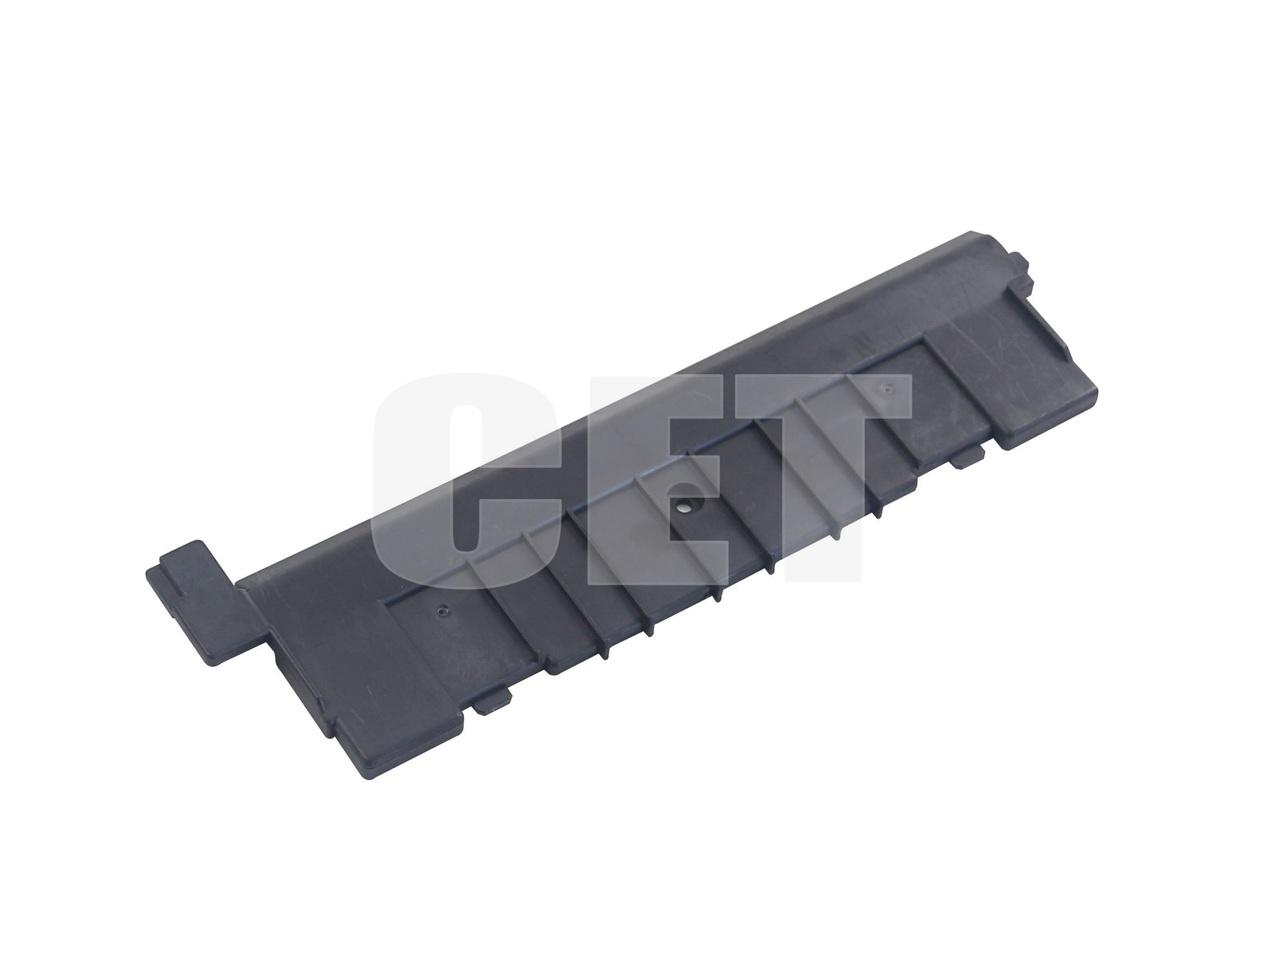 Крышка фьюзера, нижняя для KYOCERA ECOSYSM2040dn/2135dn/2635dn/P2235dn/2040dn (CET), CET371013